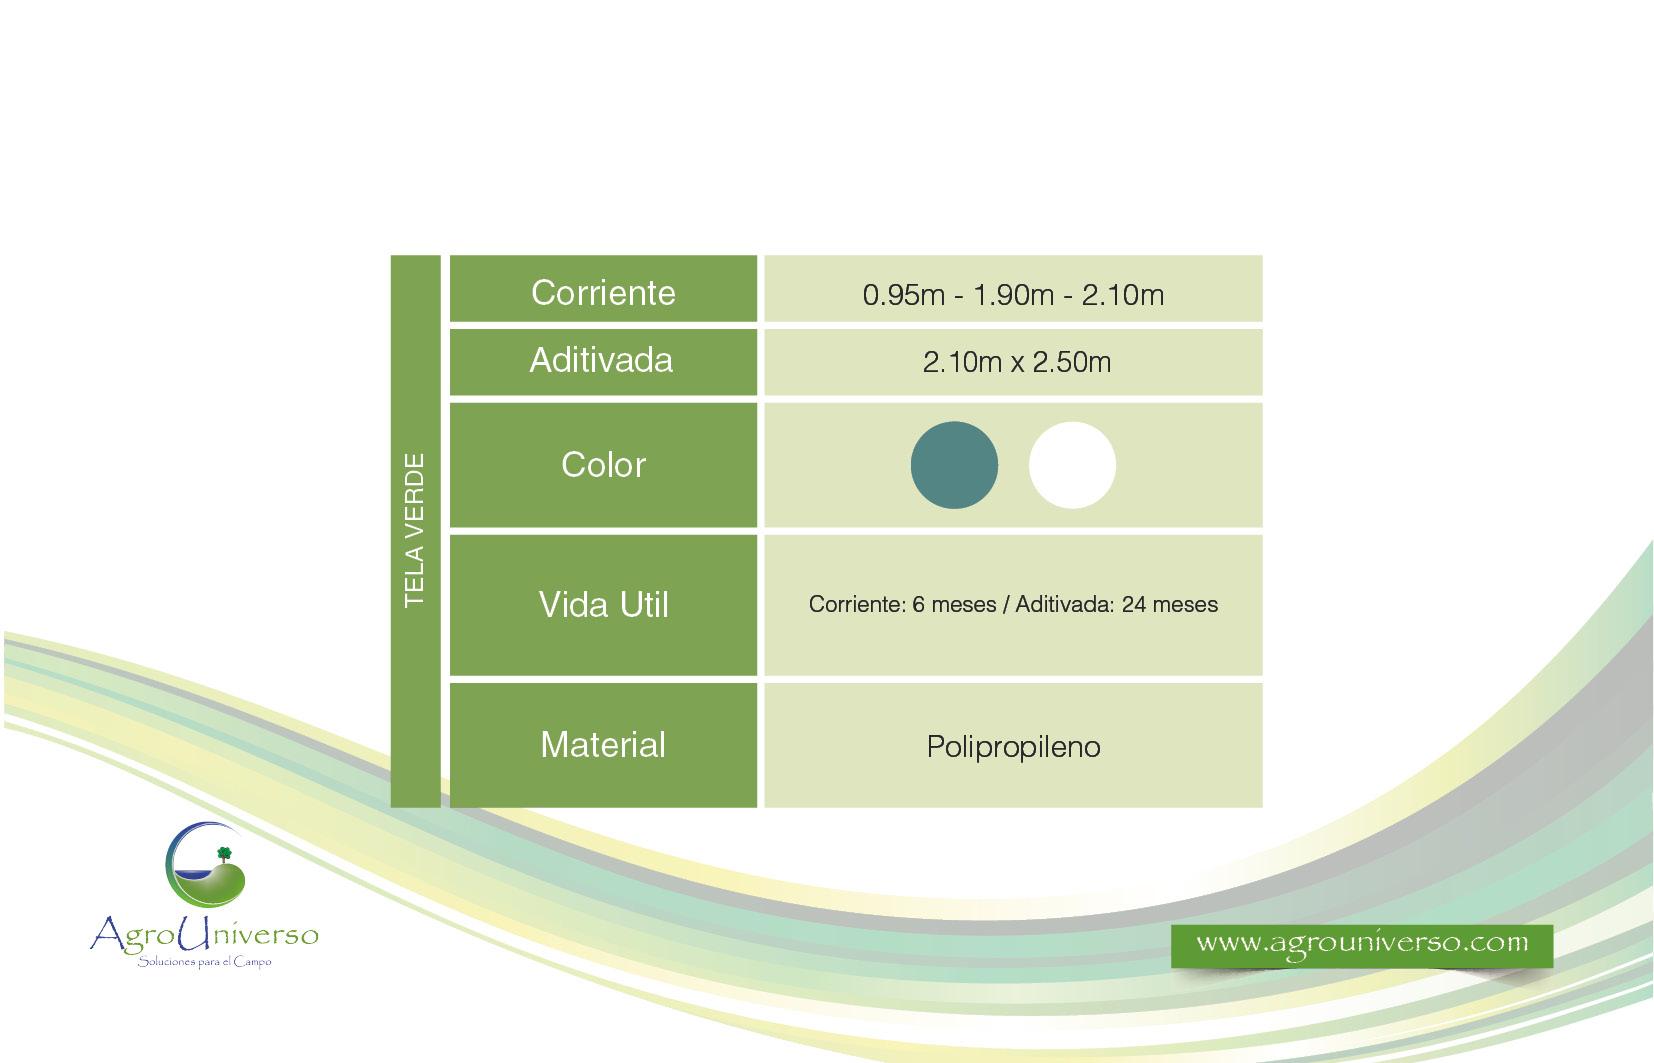 Catlogo-de-productos-Agrouniverso-19